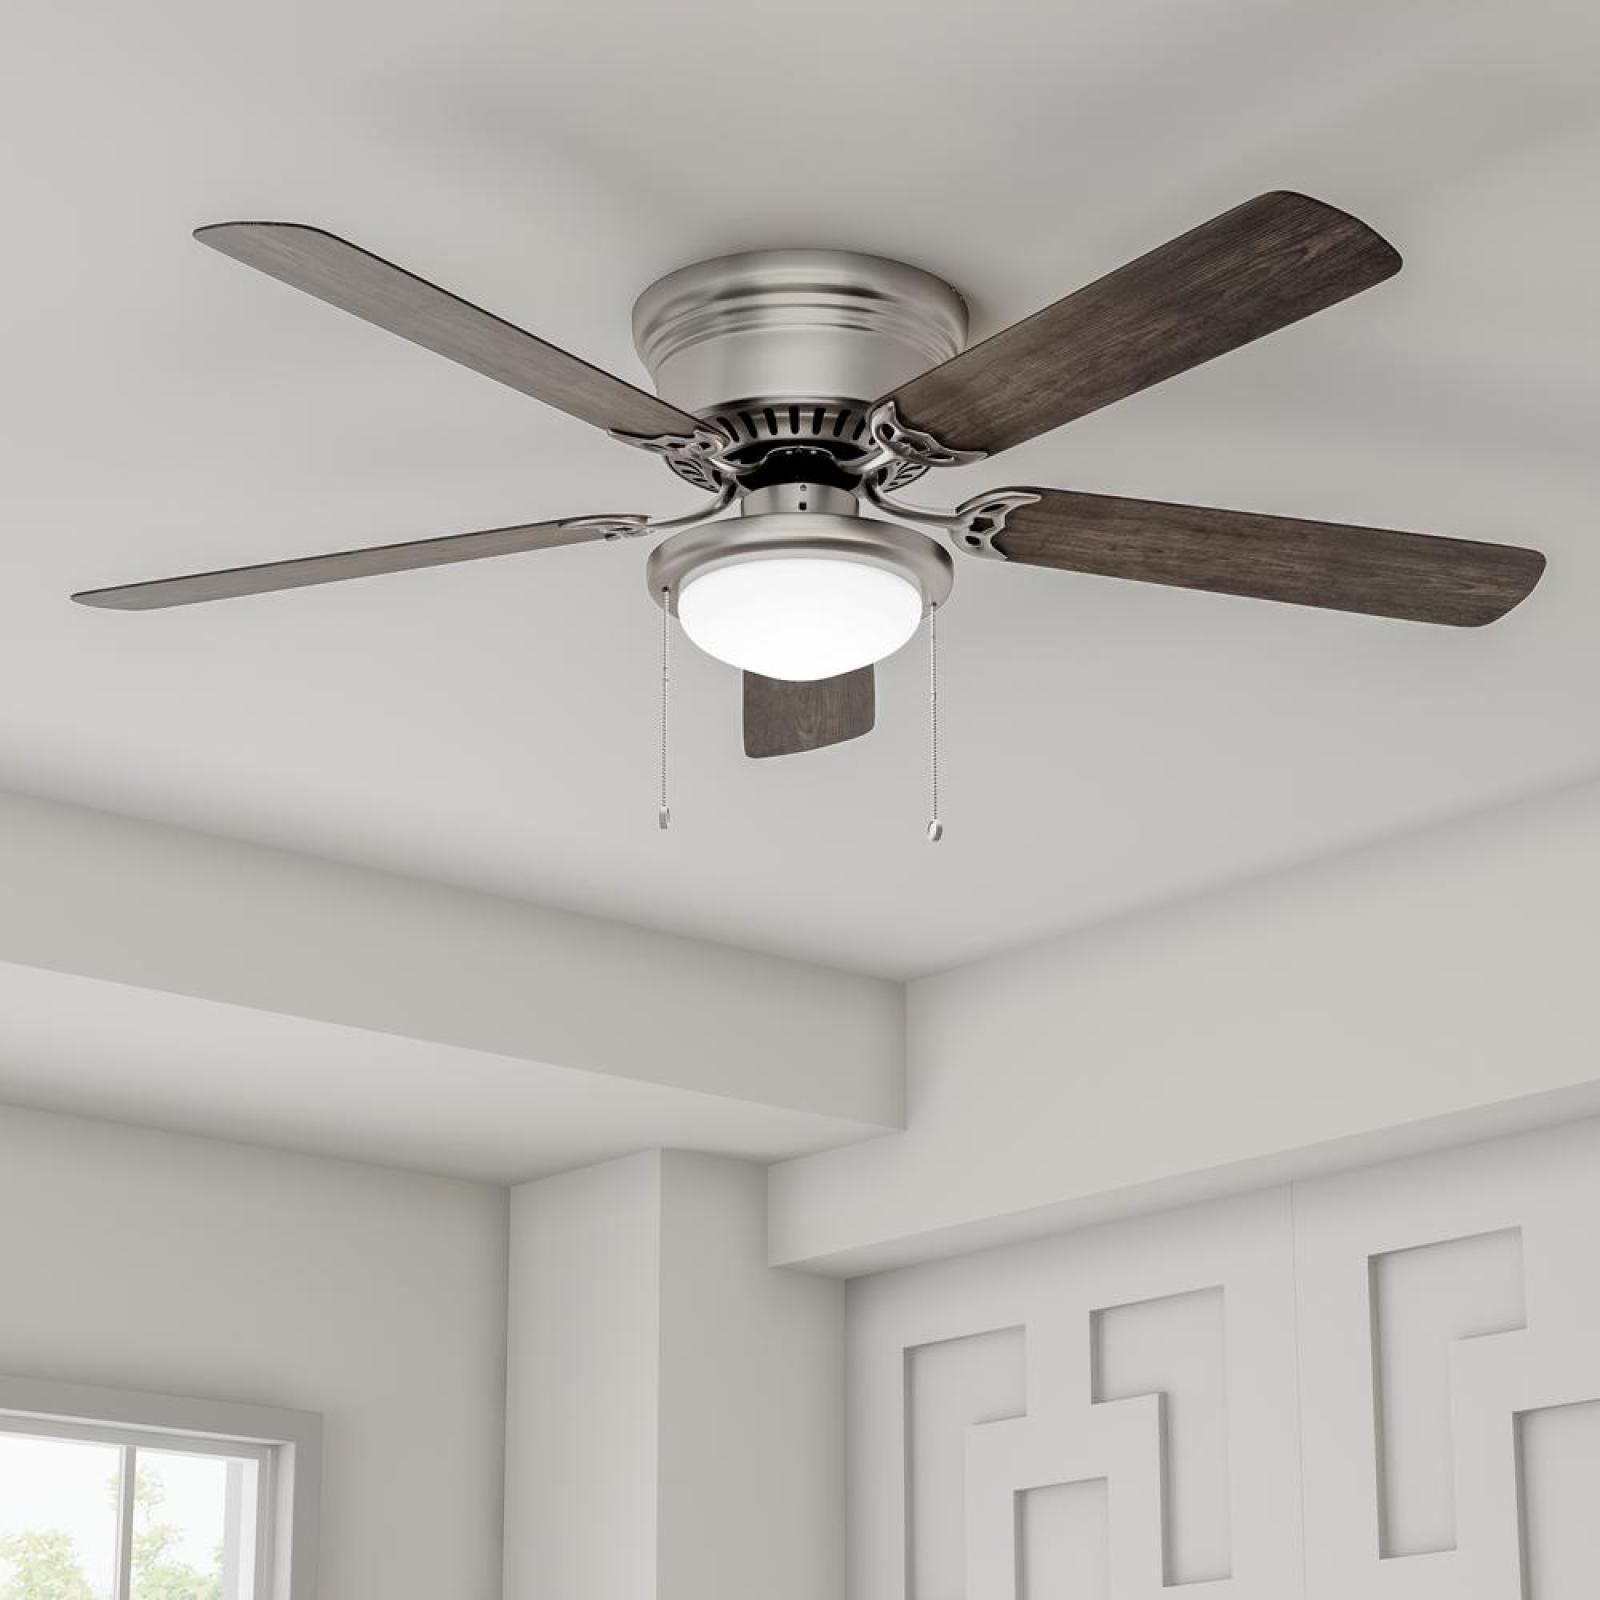 56 Large Low Profile Hugger Led Ceiling Fan Flush Mount Brushed Nickel Quiet 792145372677 Ebay